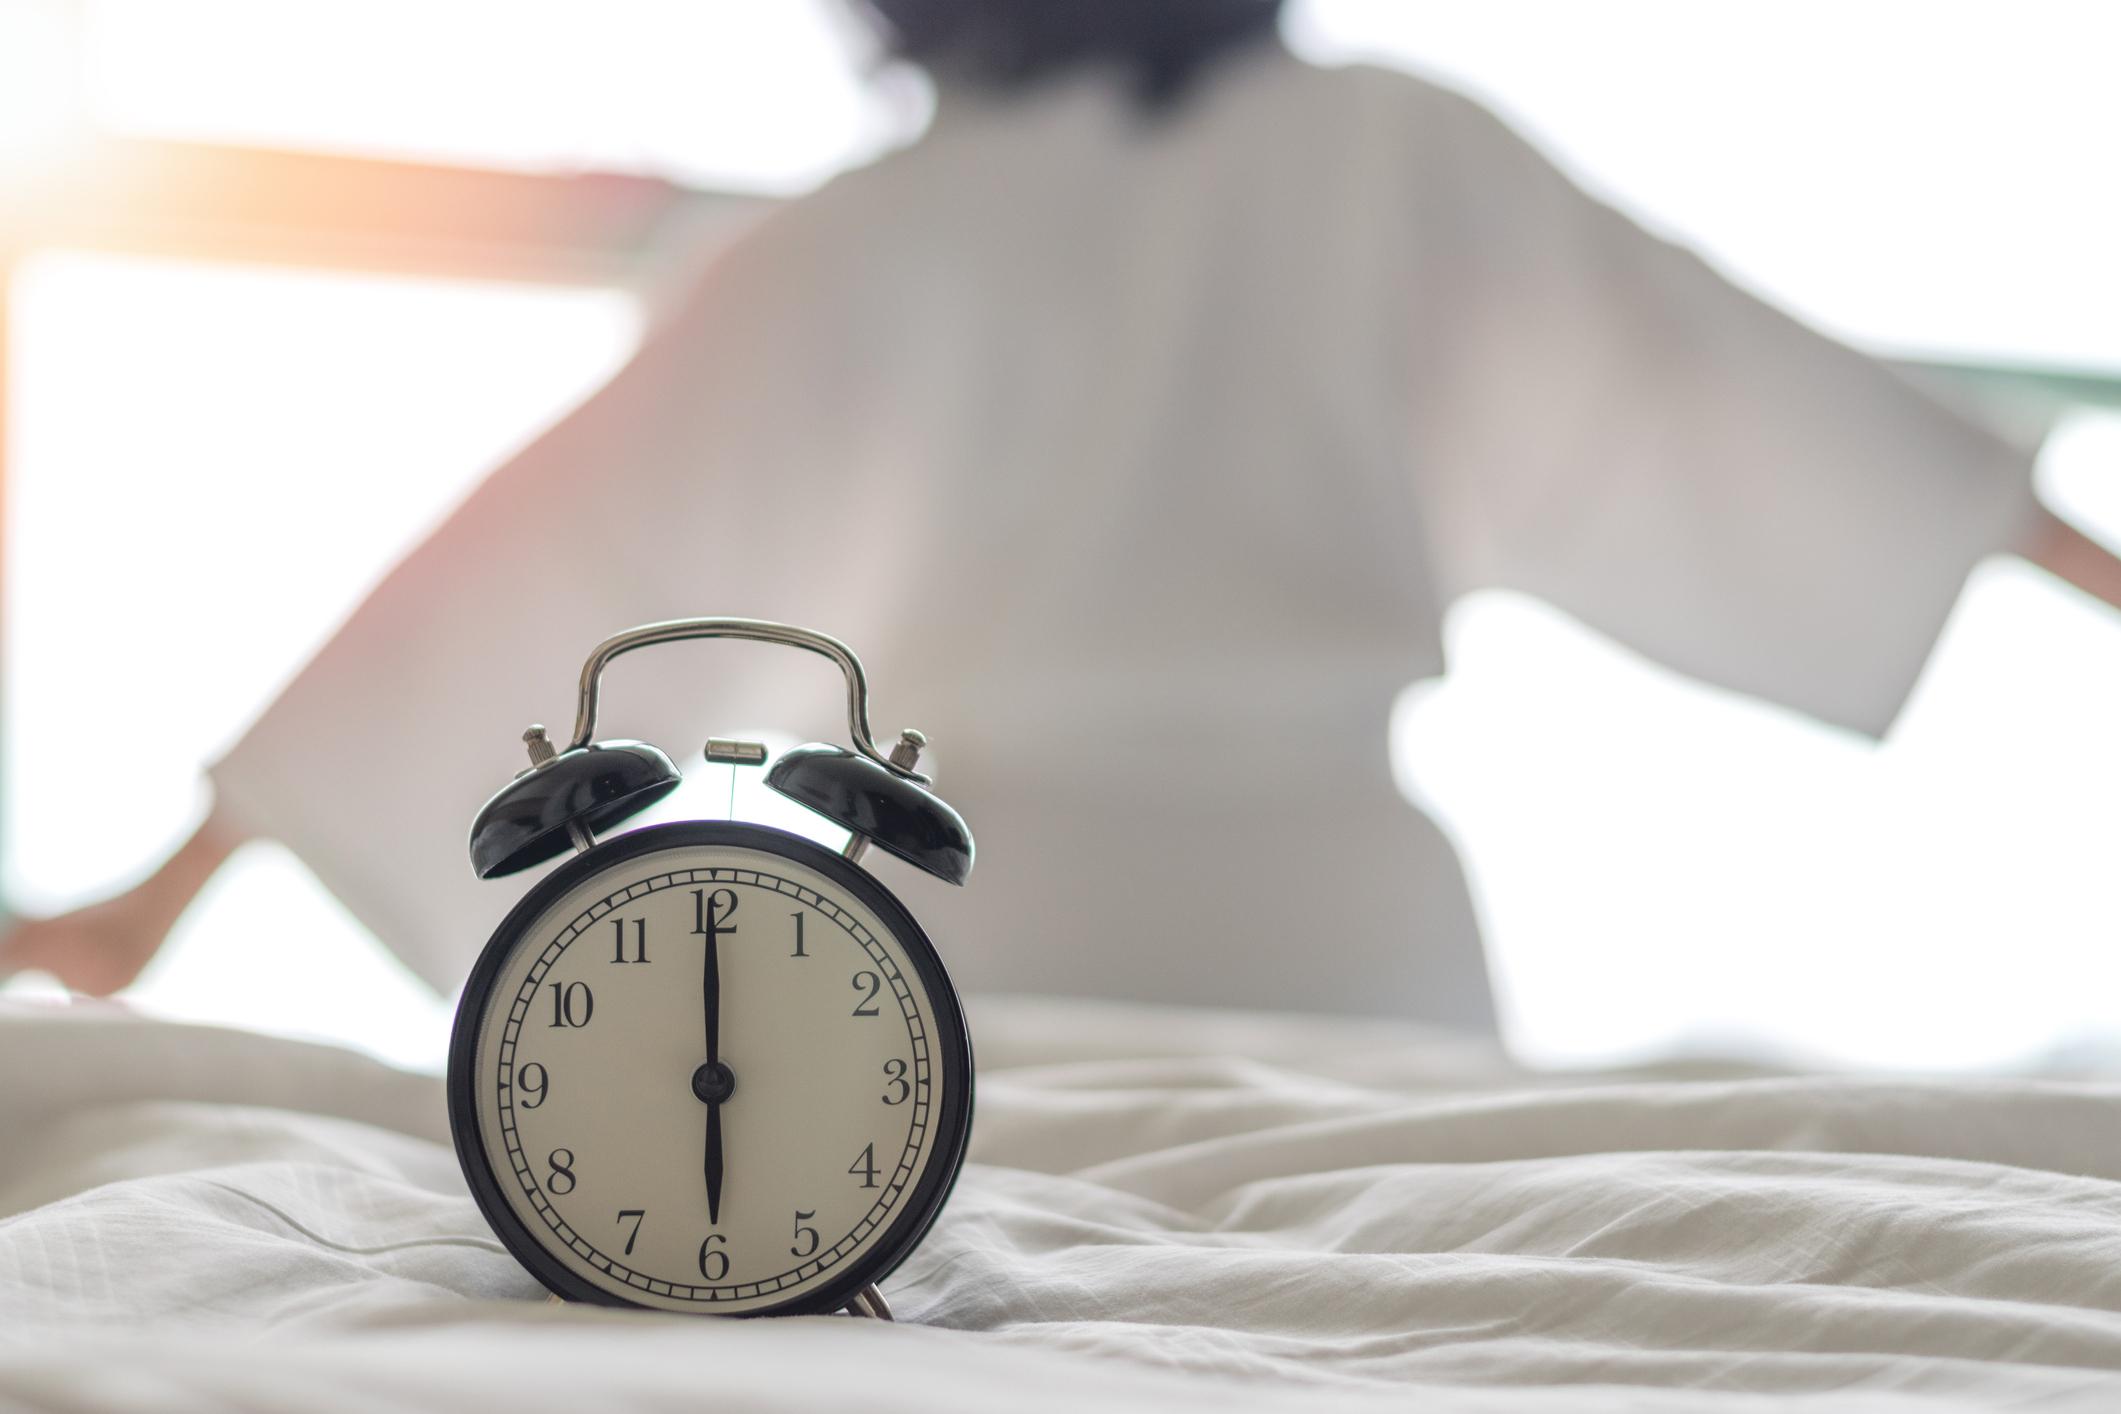 Circadian rhythm concept image, woman waking up next to clock. Image credit: iStock